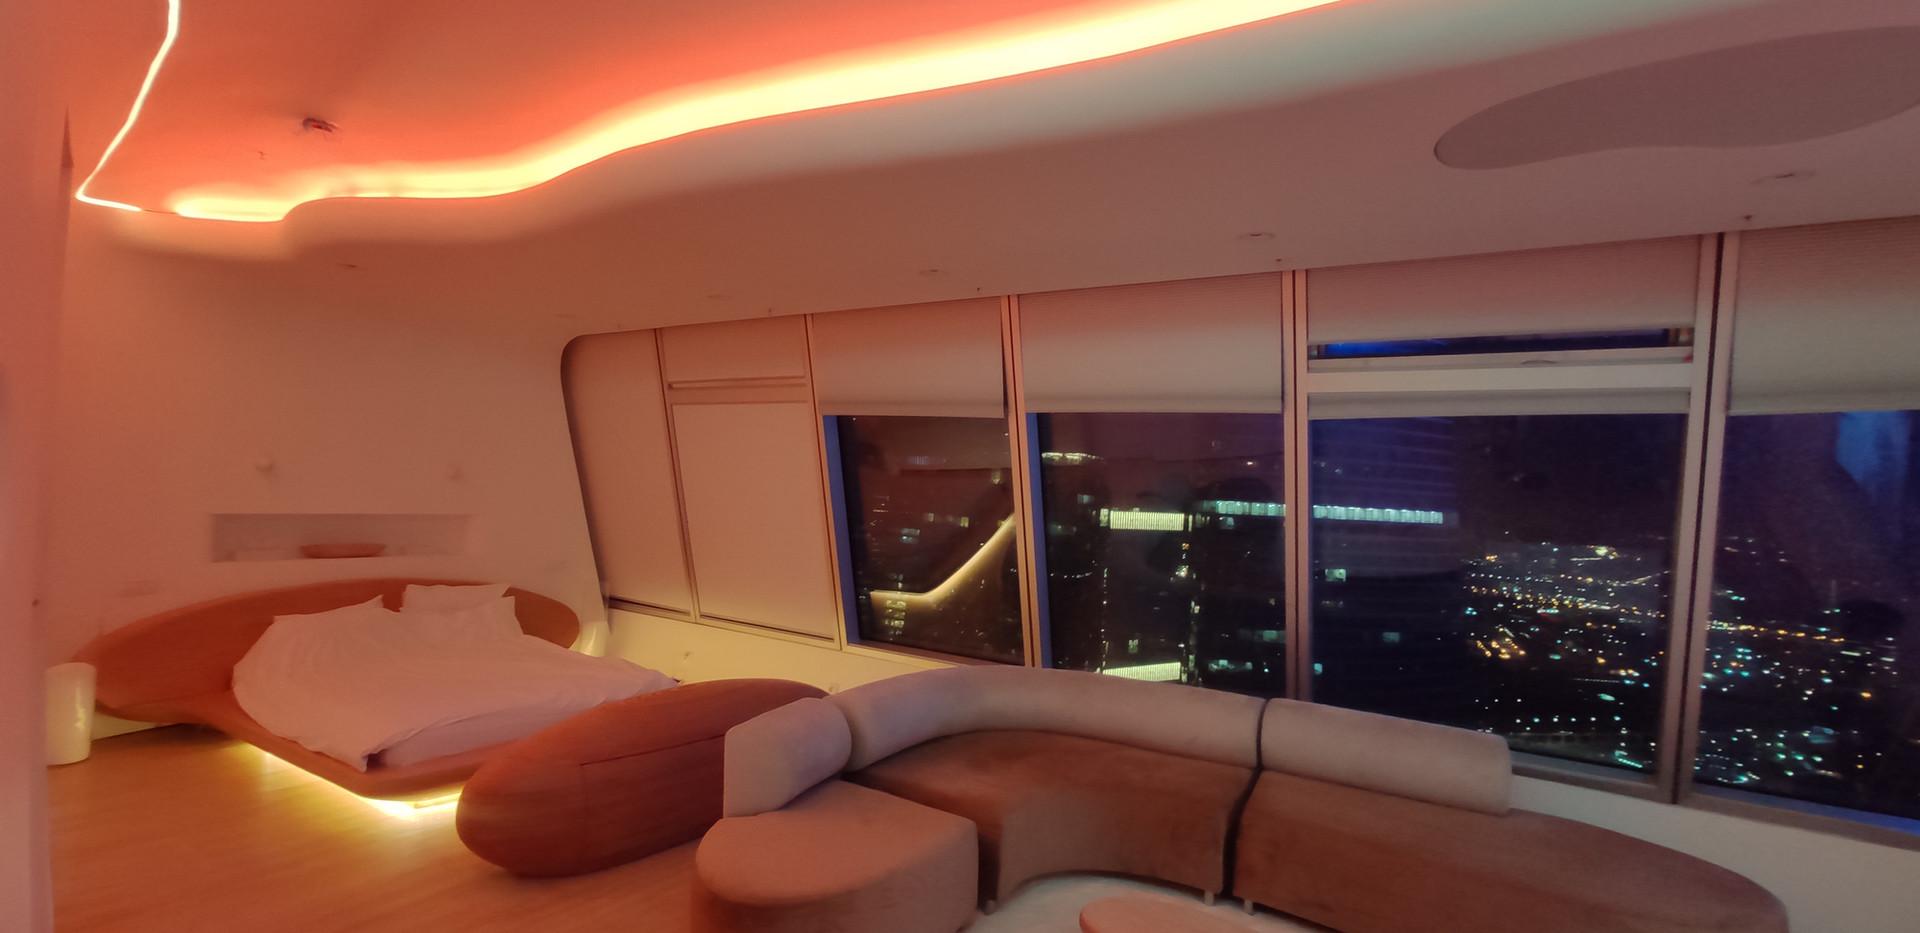 аренда апартамента в москва сити для ром